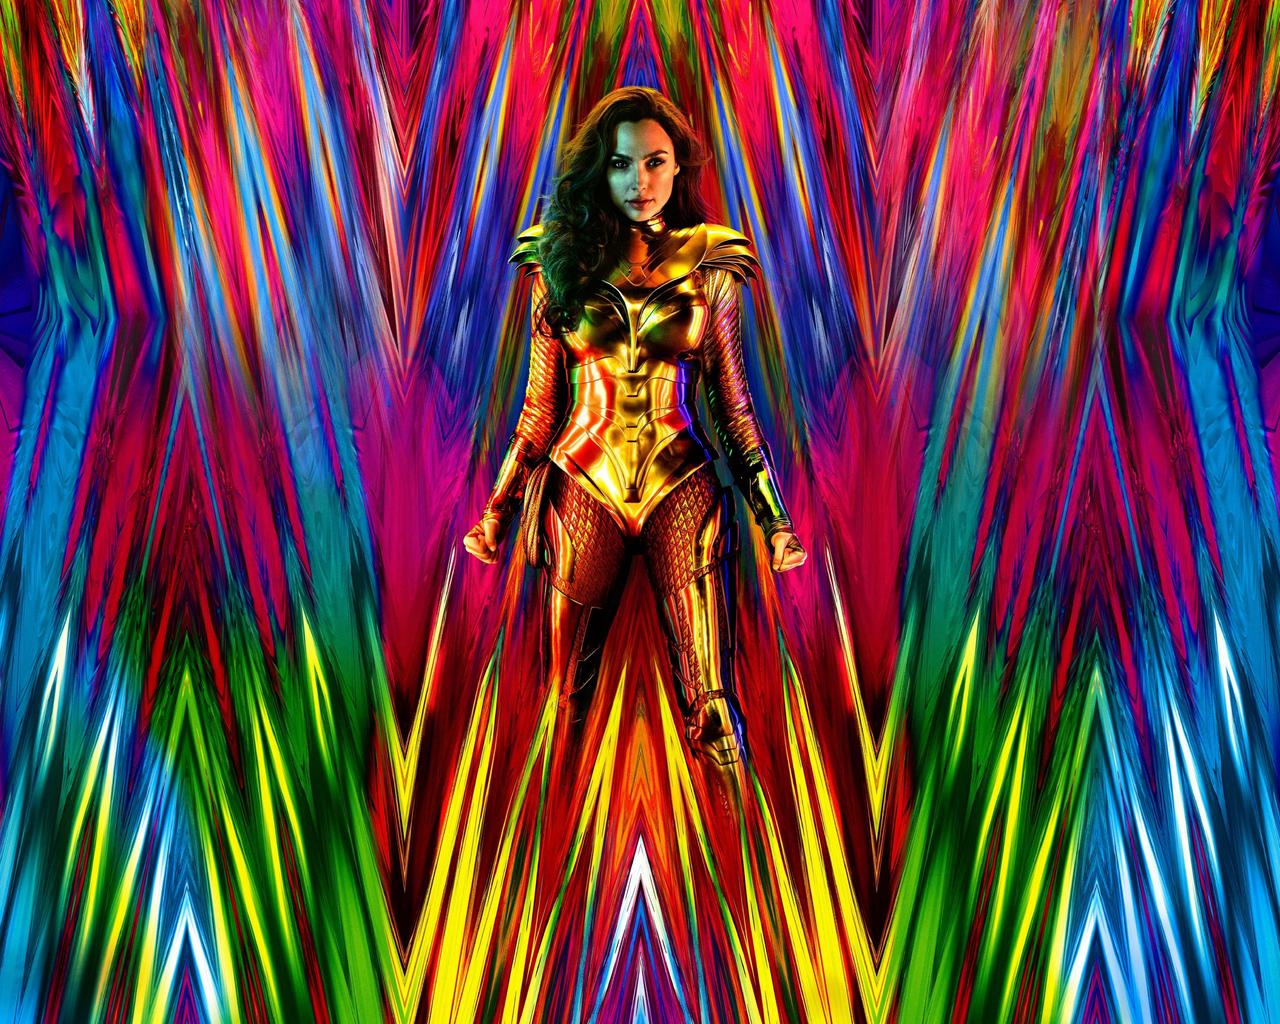 wonder-woman-1984-8k-3s.jpg